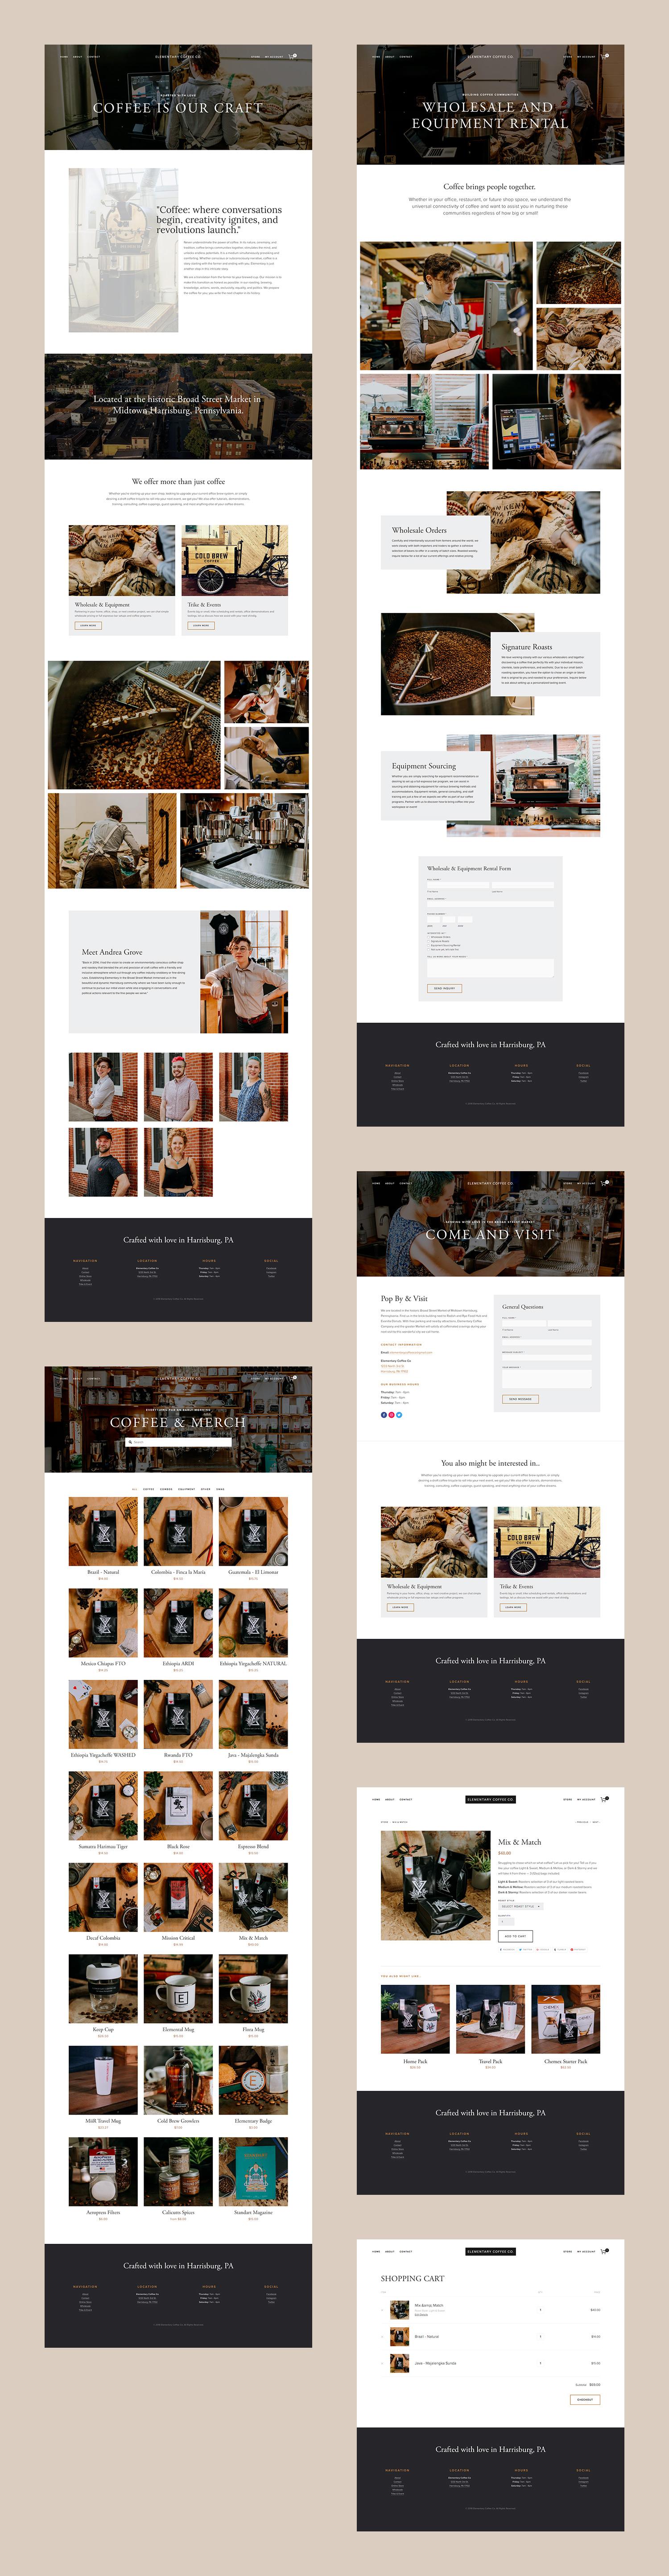 Squarespace Coffee Shop Website Screenshot 2